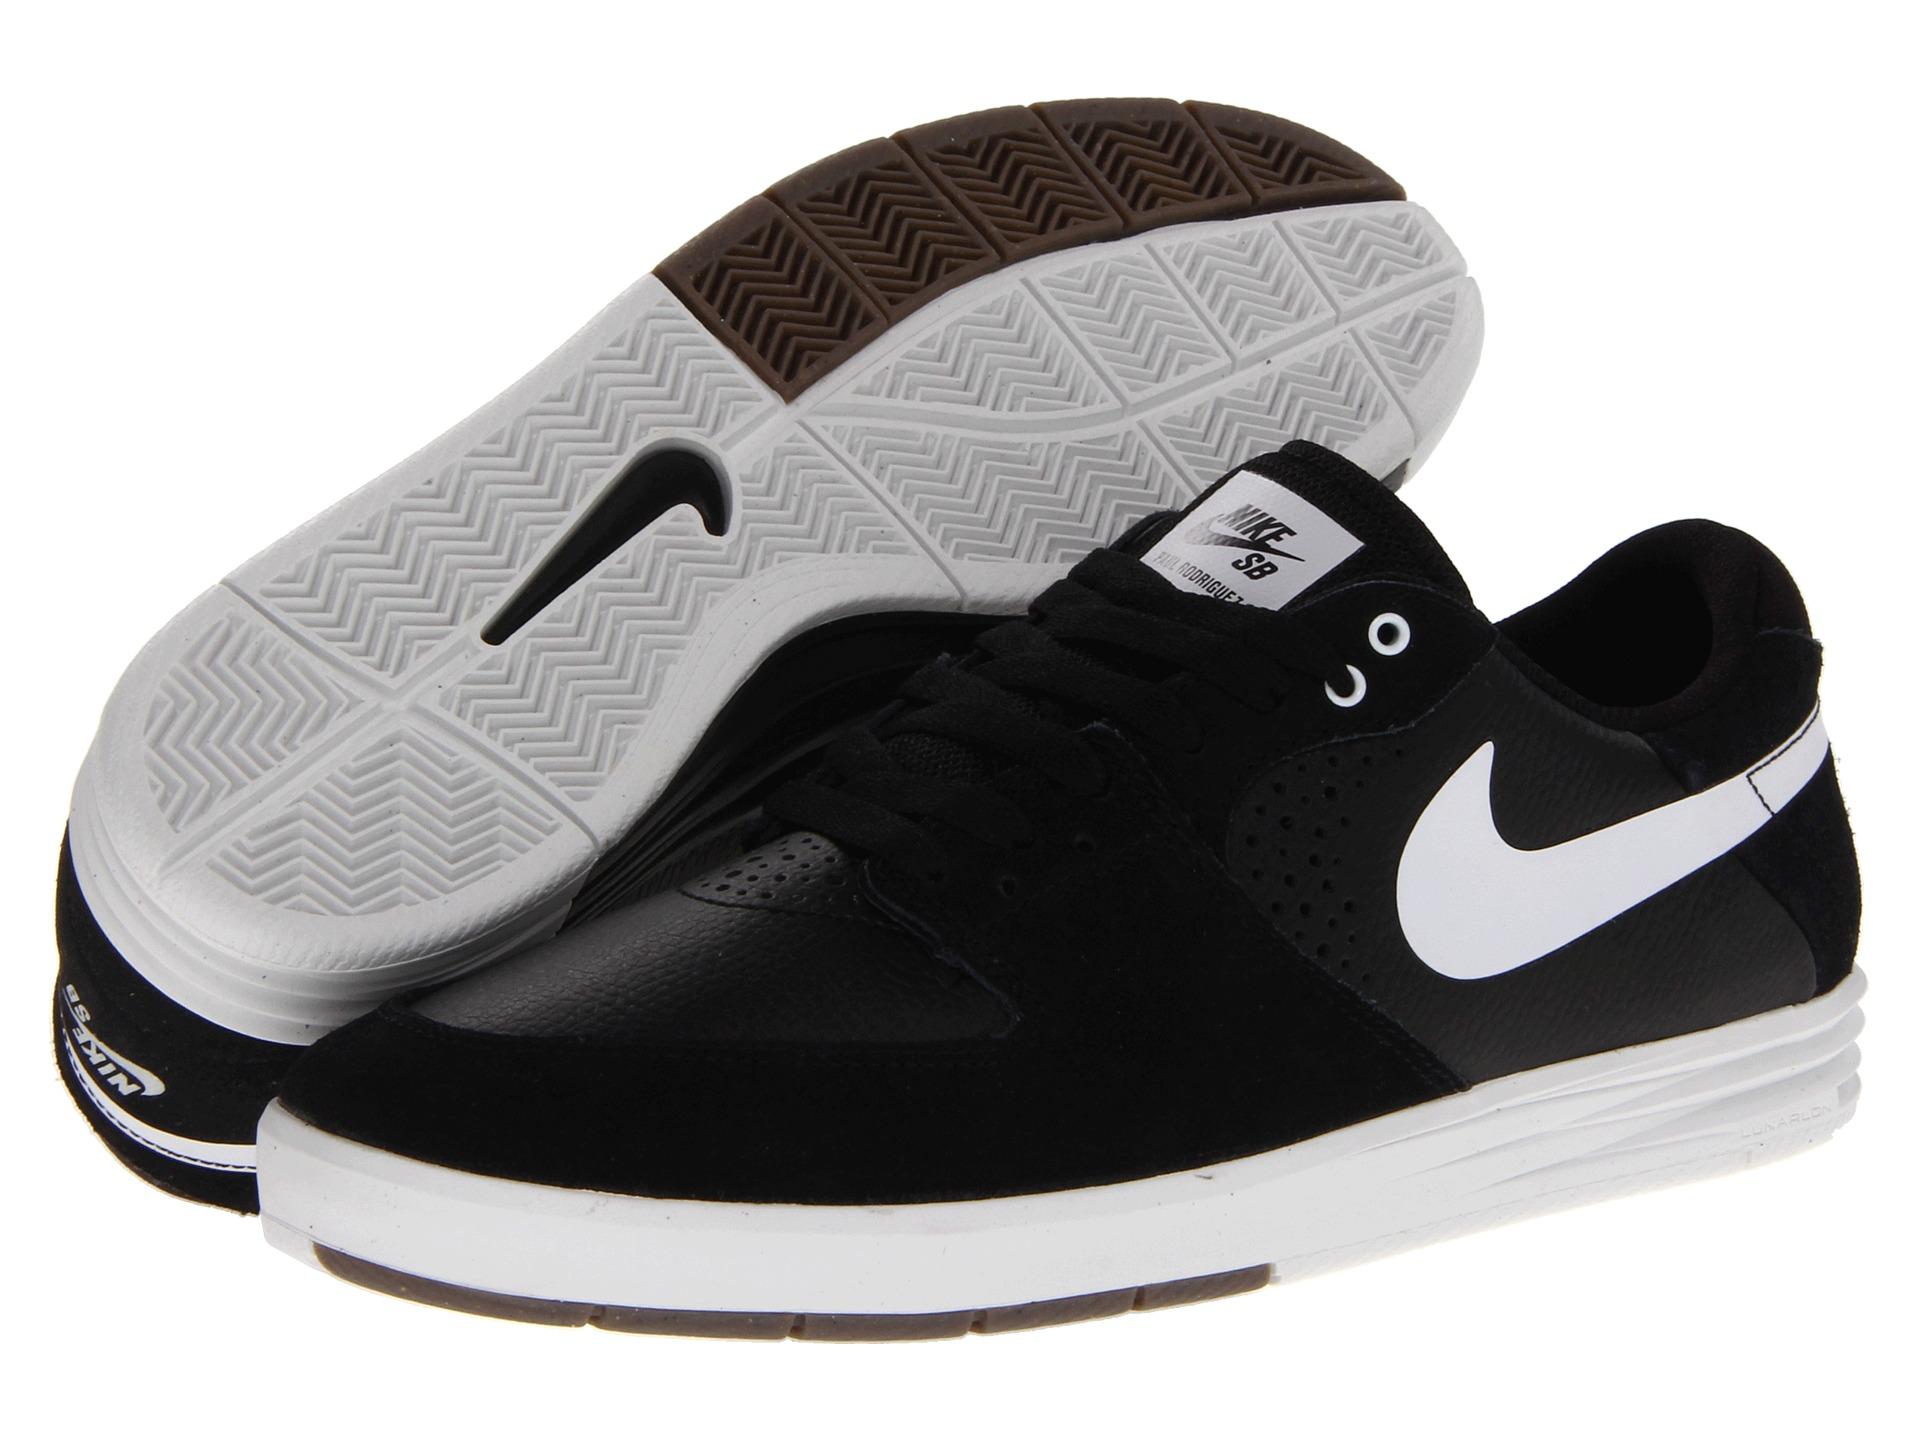 Nike Sb Paul Rodriguez 7 | Shipped Free at Zappos